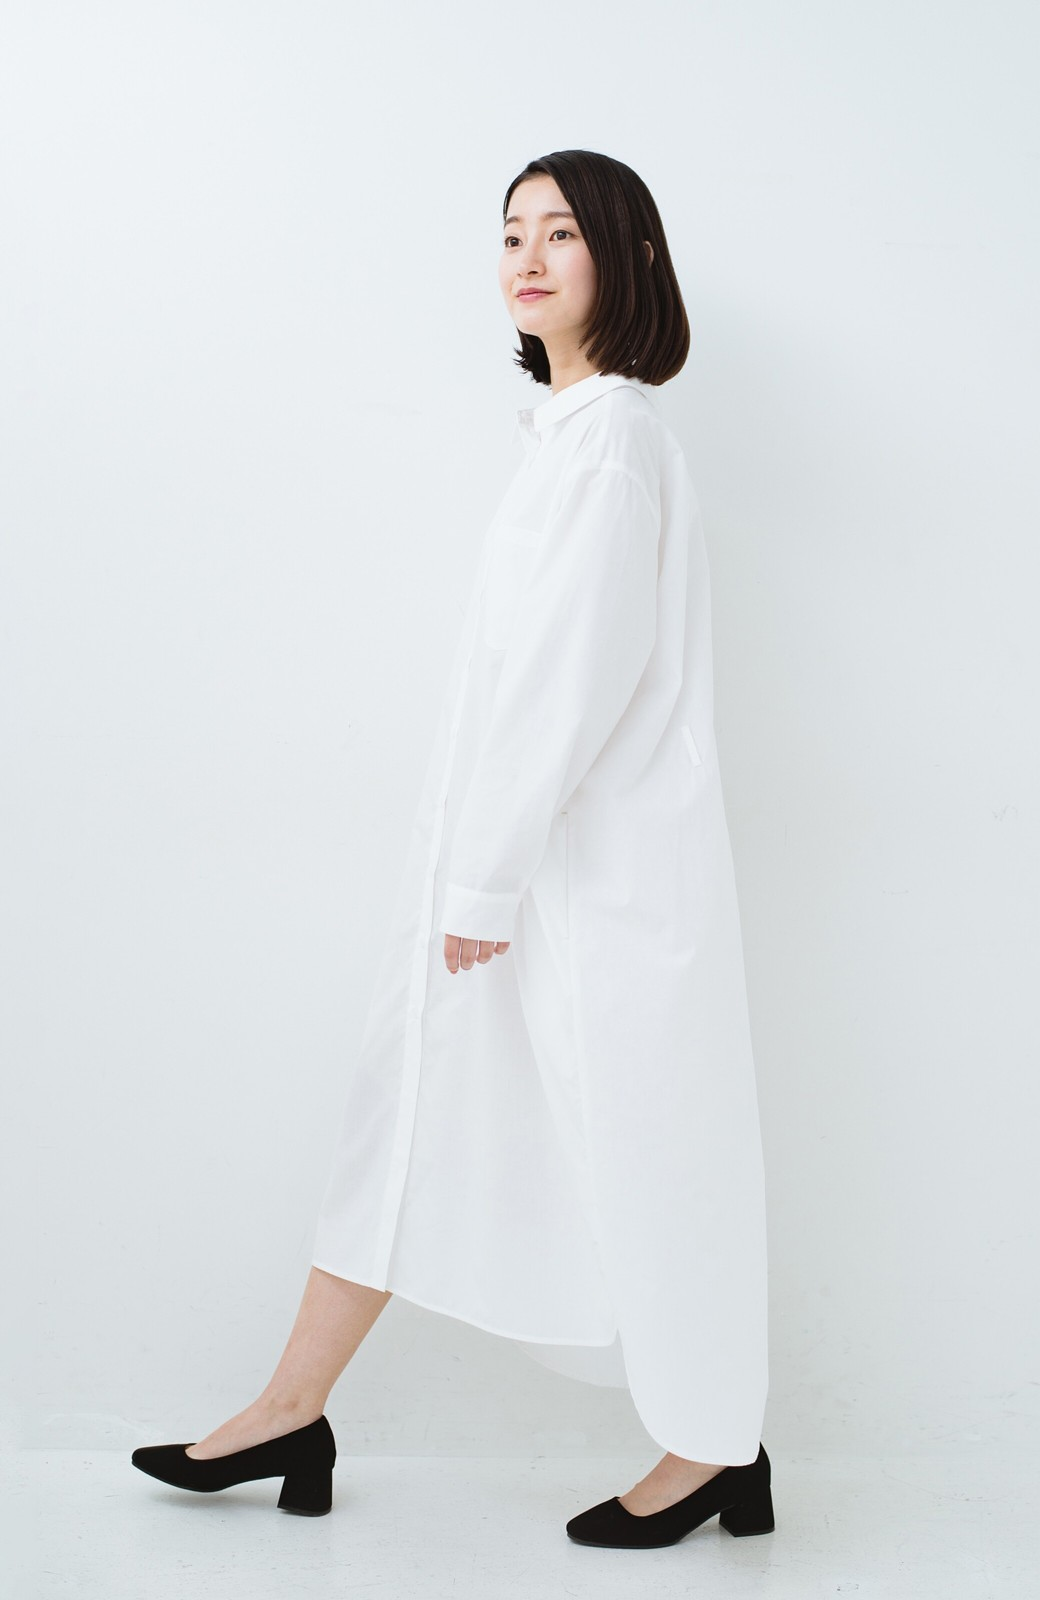 haco! 気持ちが凛と改まる リボン付きオーバーサイズシャツワンピース <ホワイト>の商品写真15